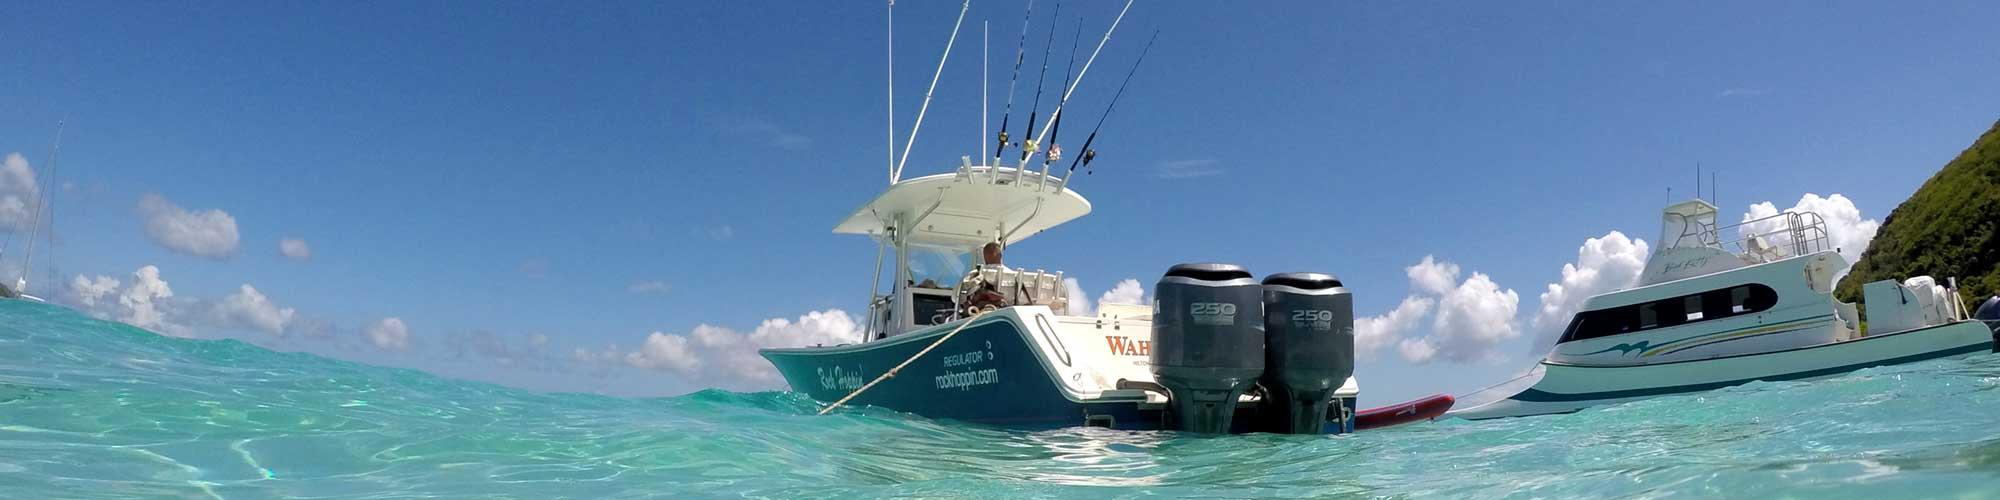 boat-trip-stjohn-charter-2000